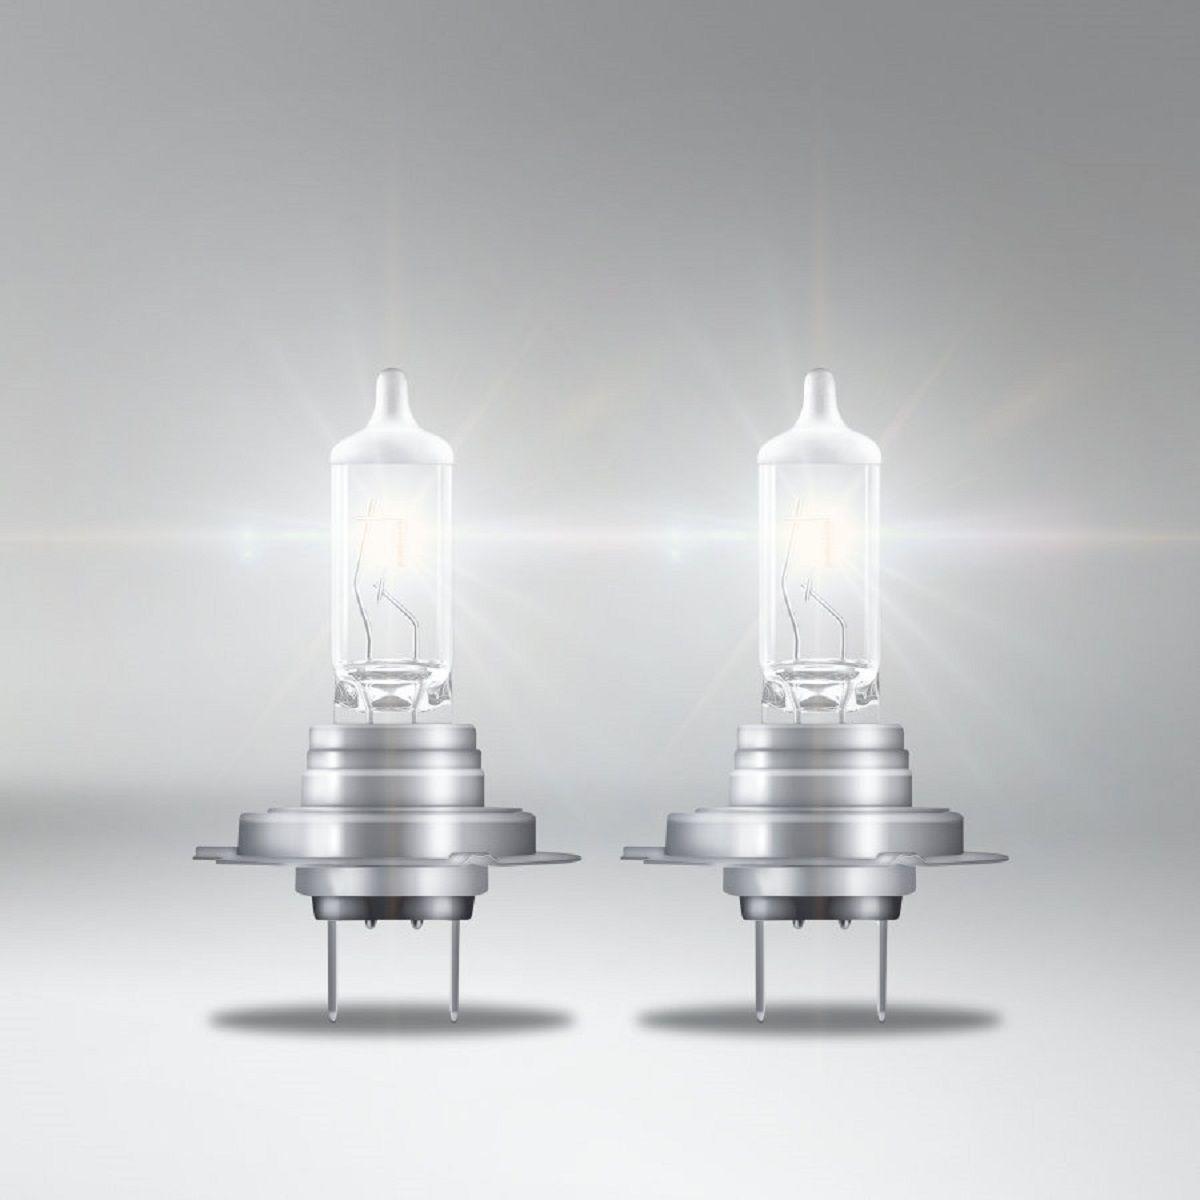 Lampada Farol  Carro Osram Night Breaker Silver H7 100% + Luz 3.200k  - Rea Comércio - Sua Loja Completa!